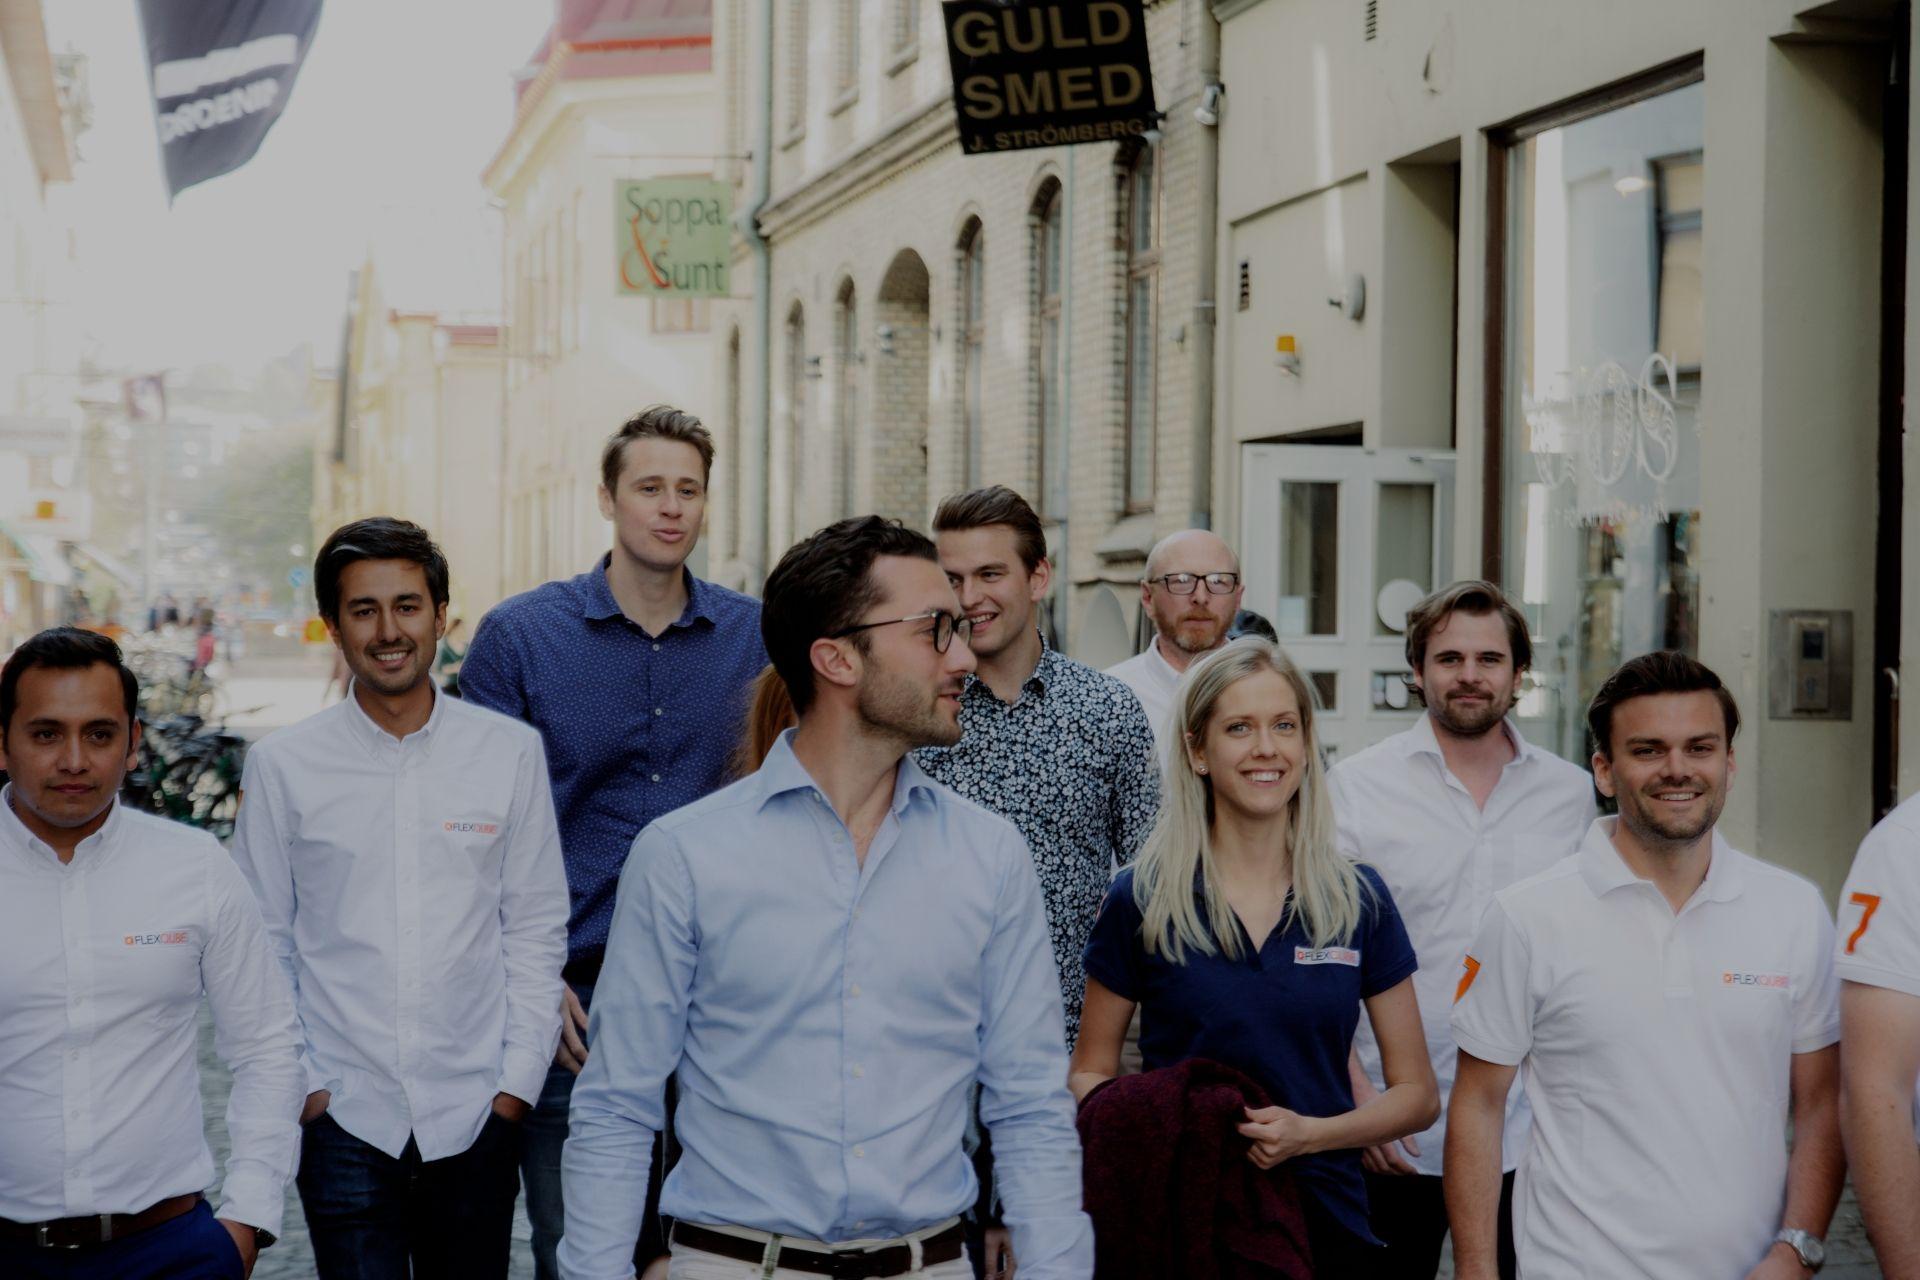 FlexQube team walking down the street.